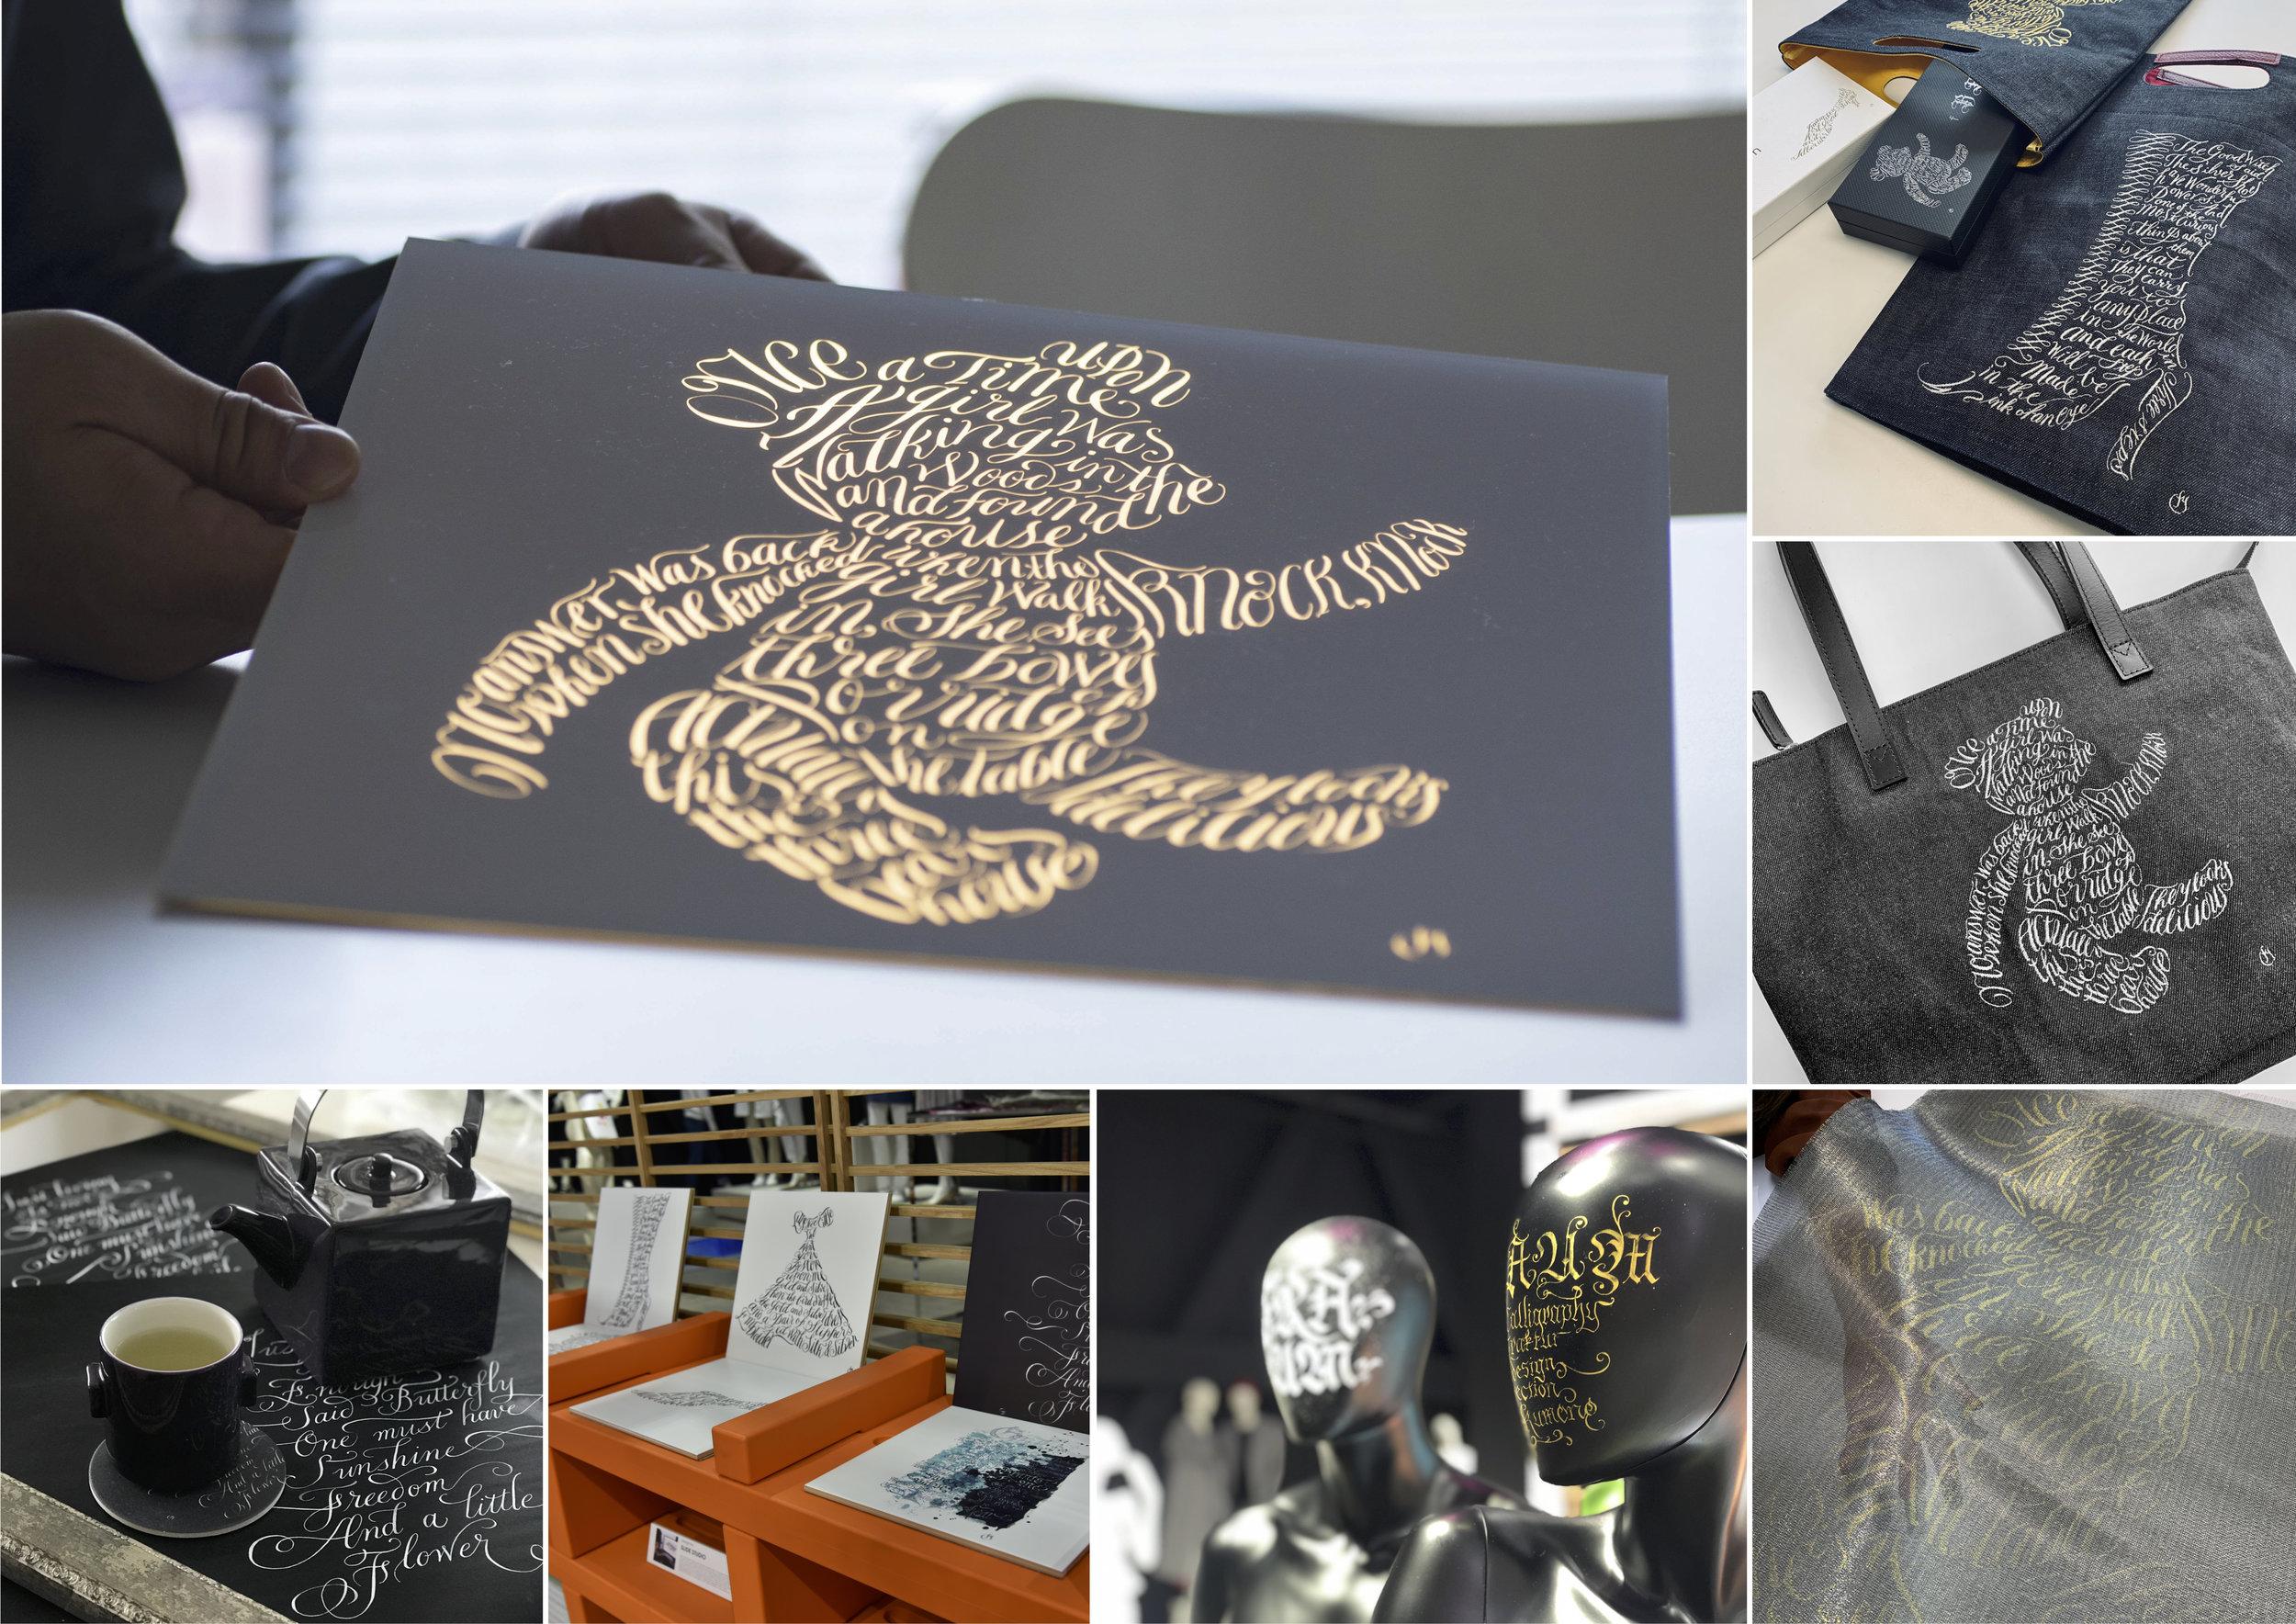 [fRAum] - Design by: KAZUKI KUMONO & YOKO FRAKTURVisual: Corporate Identity DesignWebsite: http://fraktur.amebaownd.com